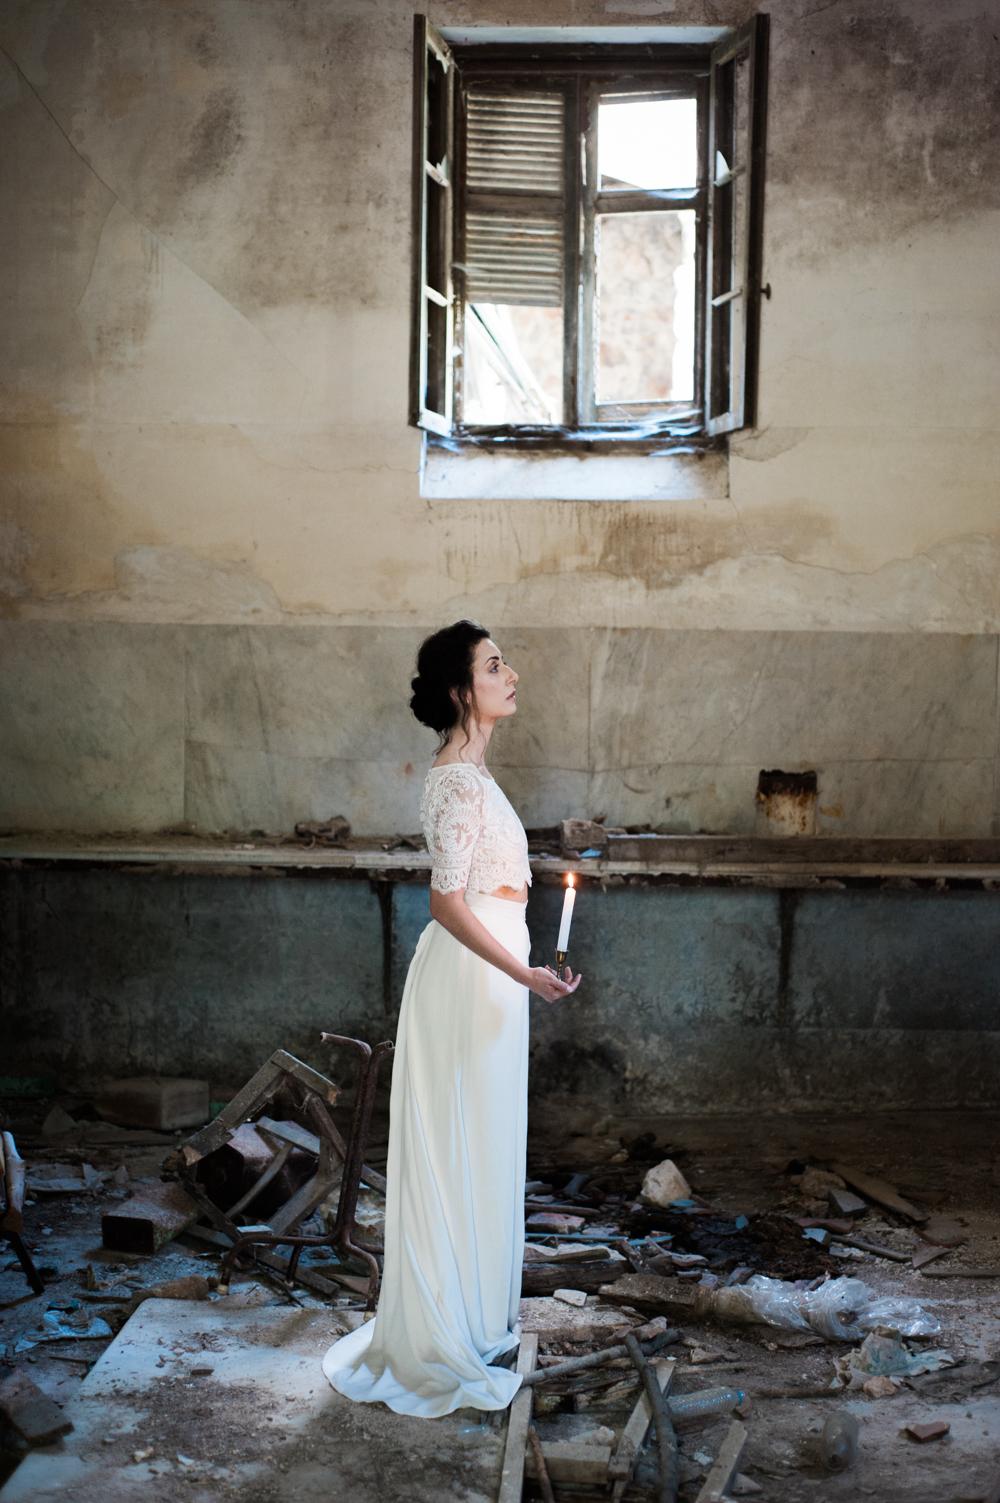 Dstination Wedding Photographer in Greece